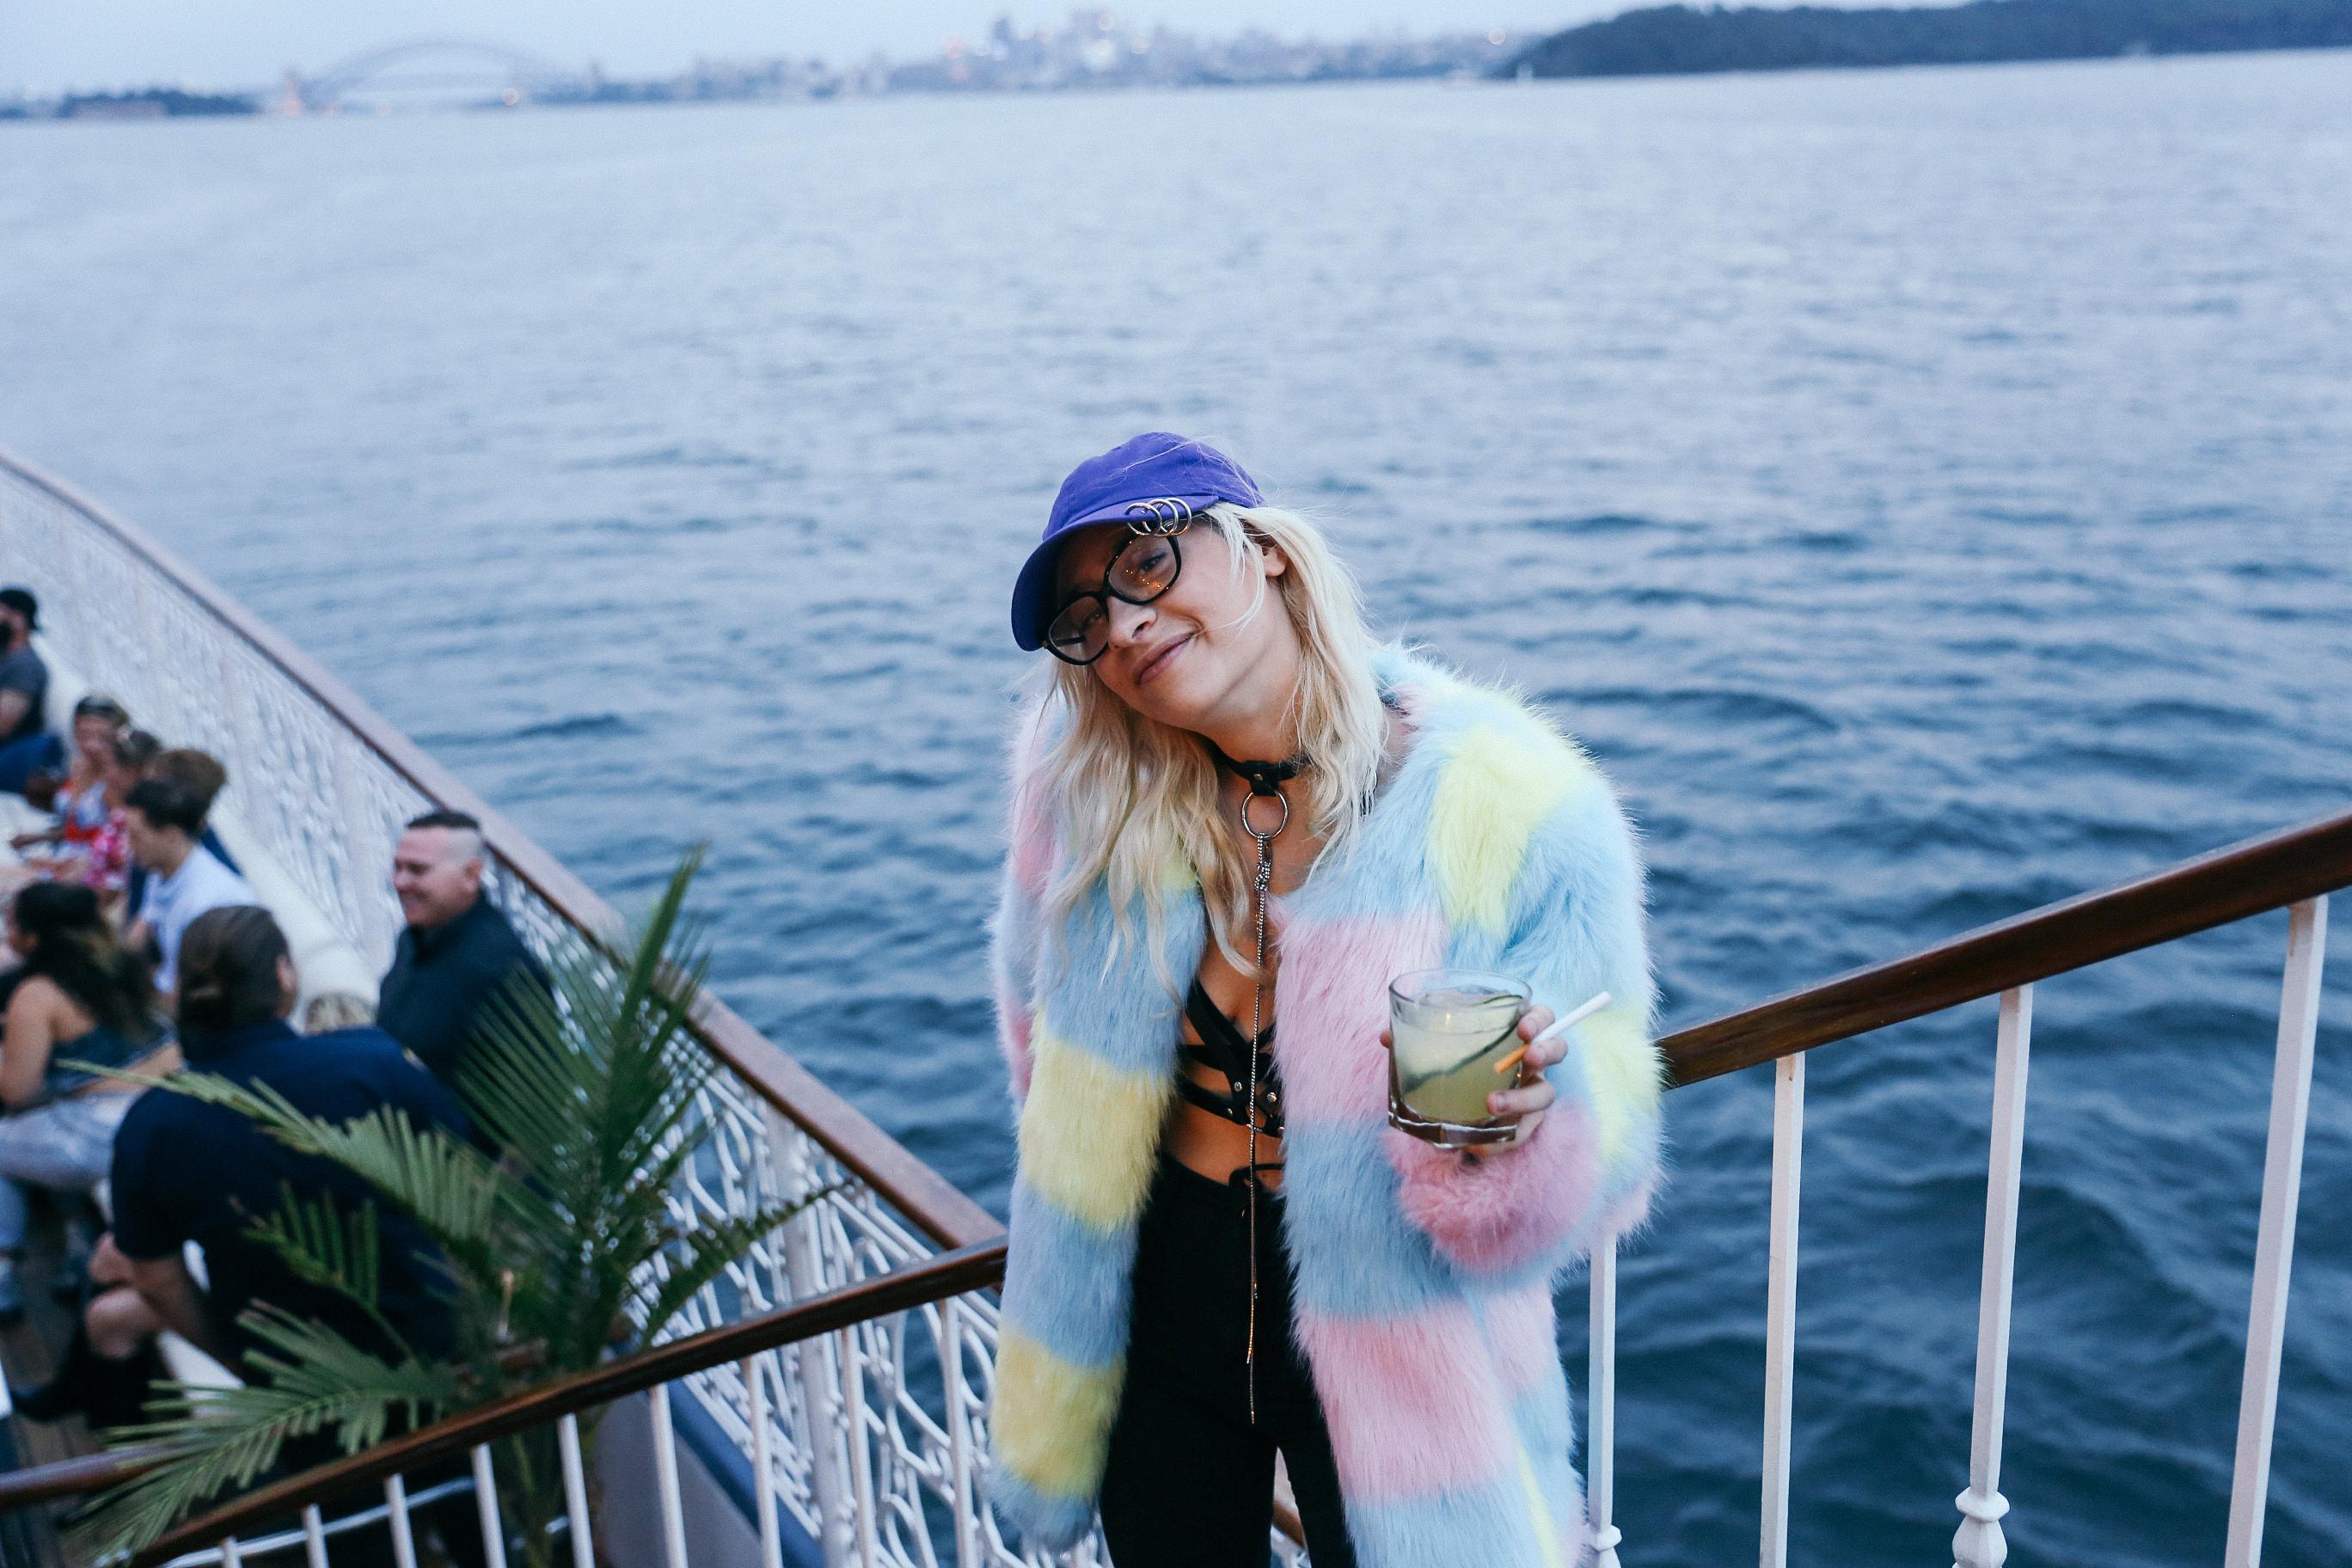 FBi Presents The Island 4.0 (Laneway x Siberia) | 2.2.17 | Photo by Satsuki Minoda